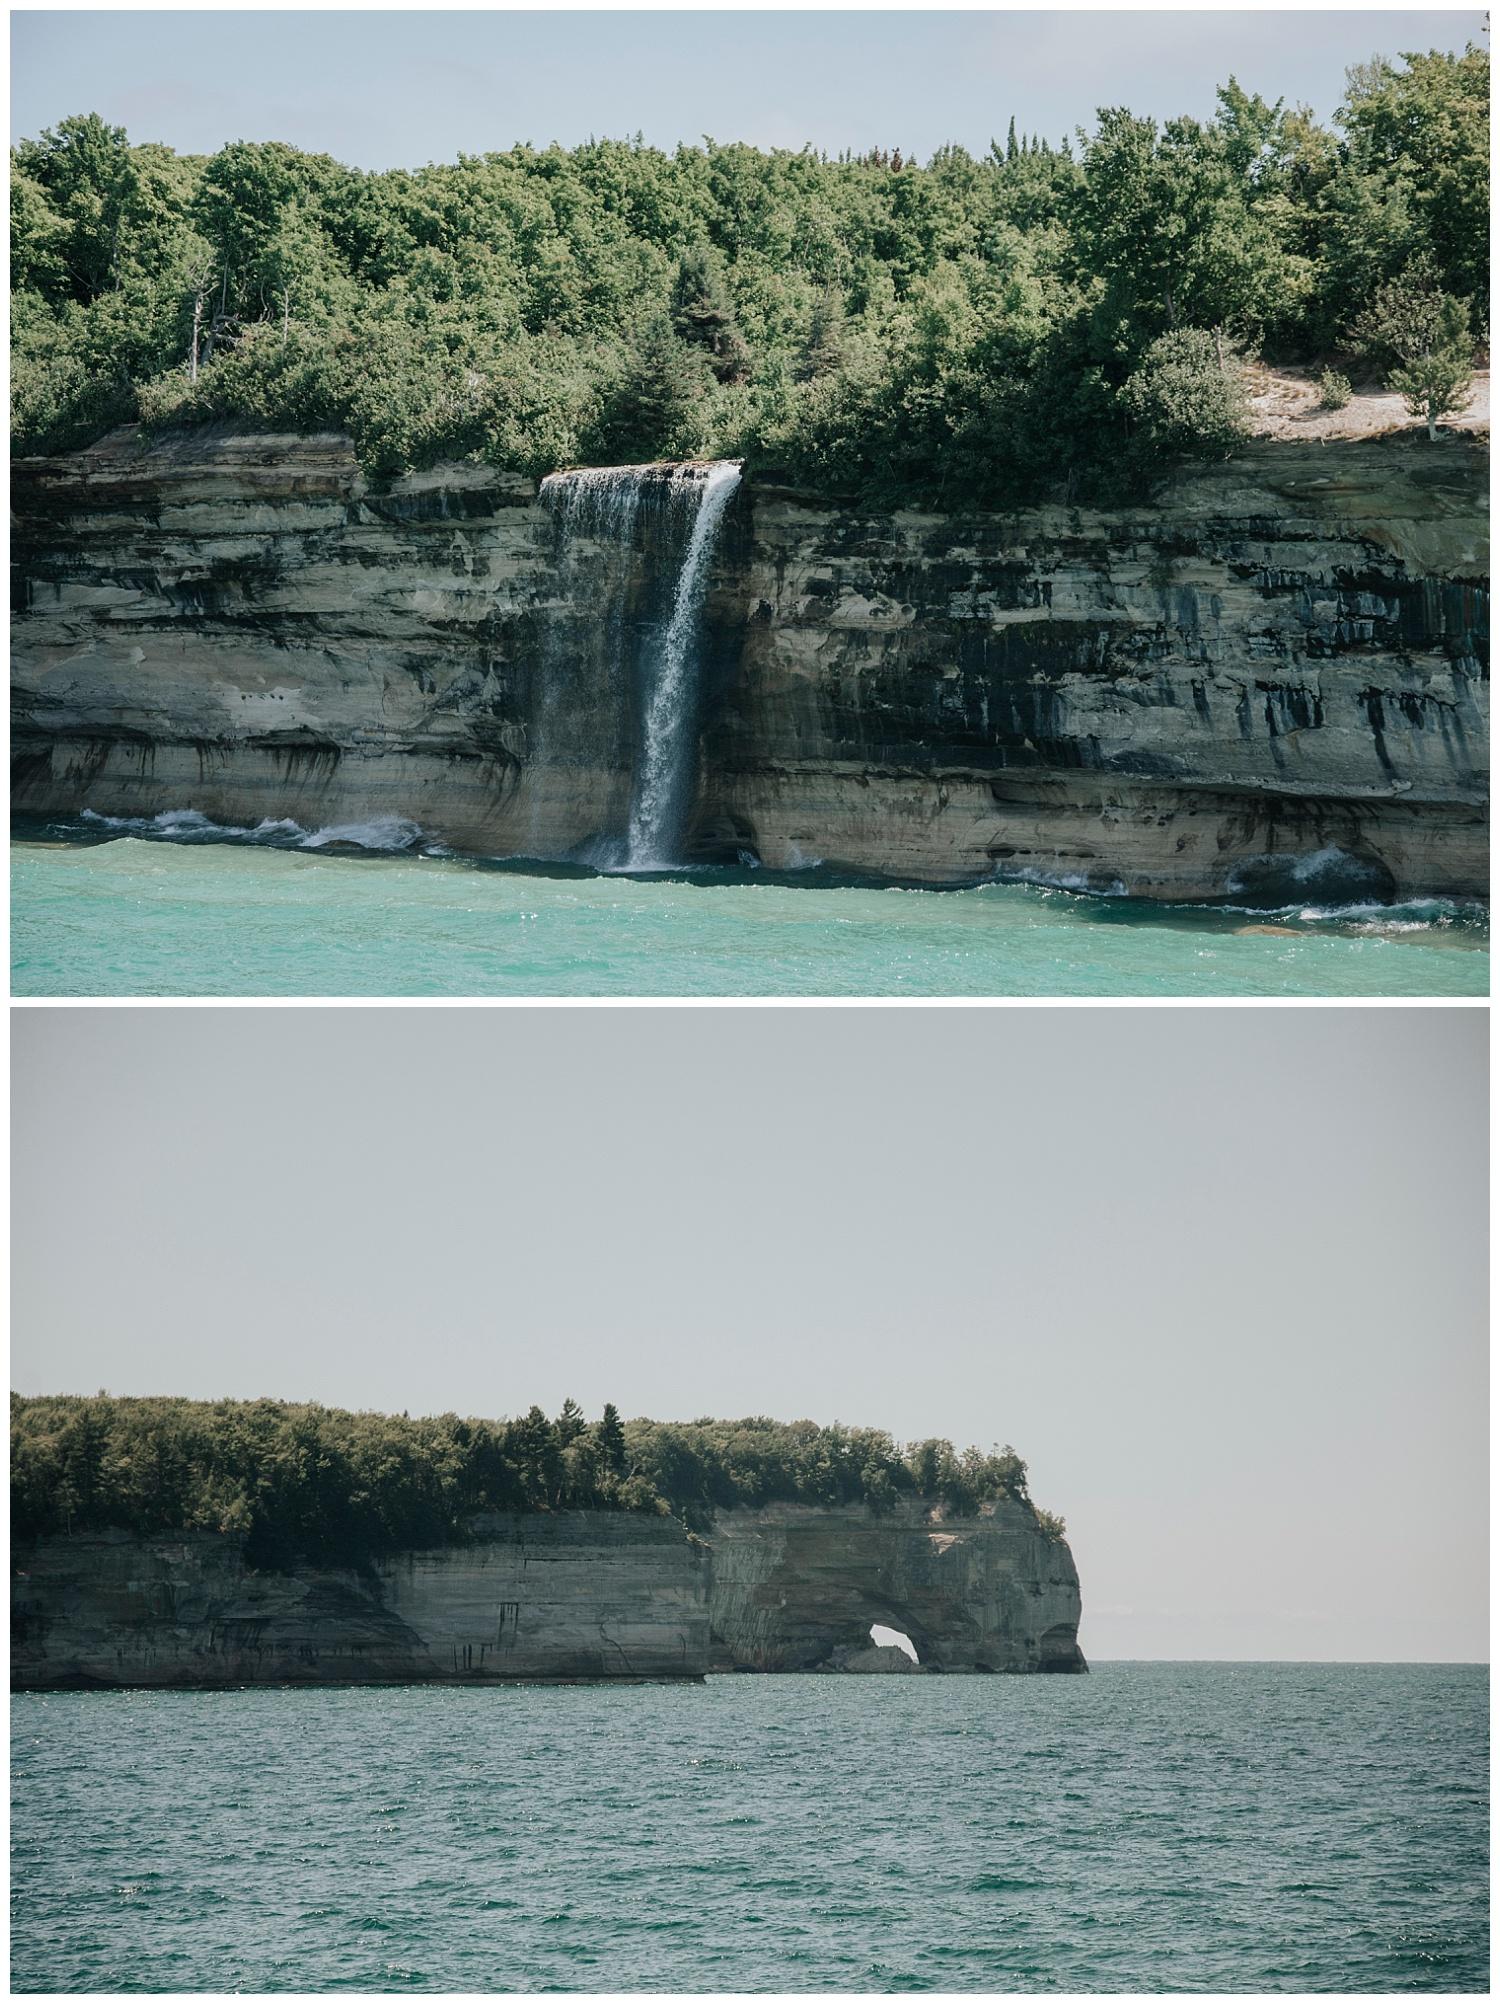 Boating near Munising, Michigan| Pictured Rocks National Lakeshore| Elopement Inspiration| Wild Onyx Photography